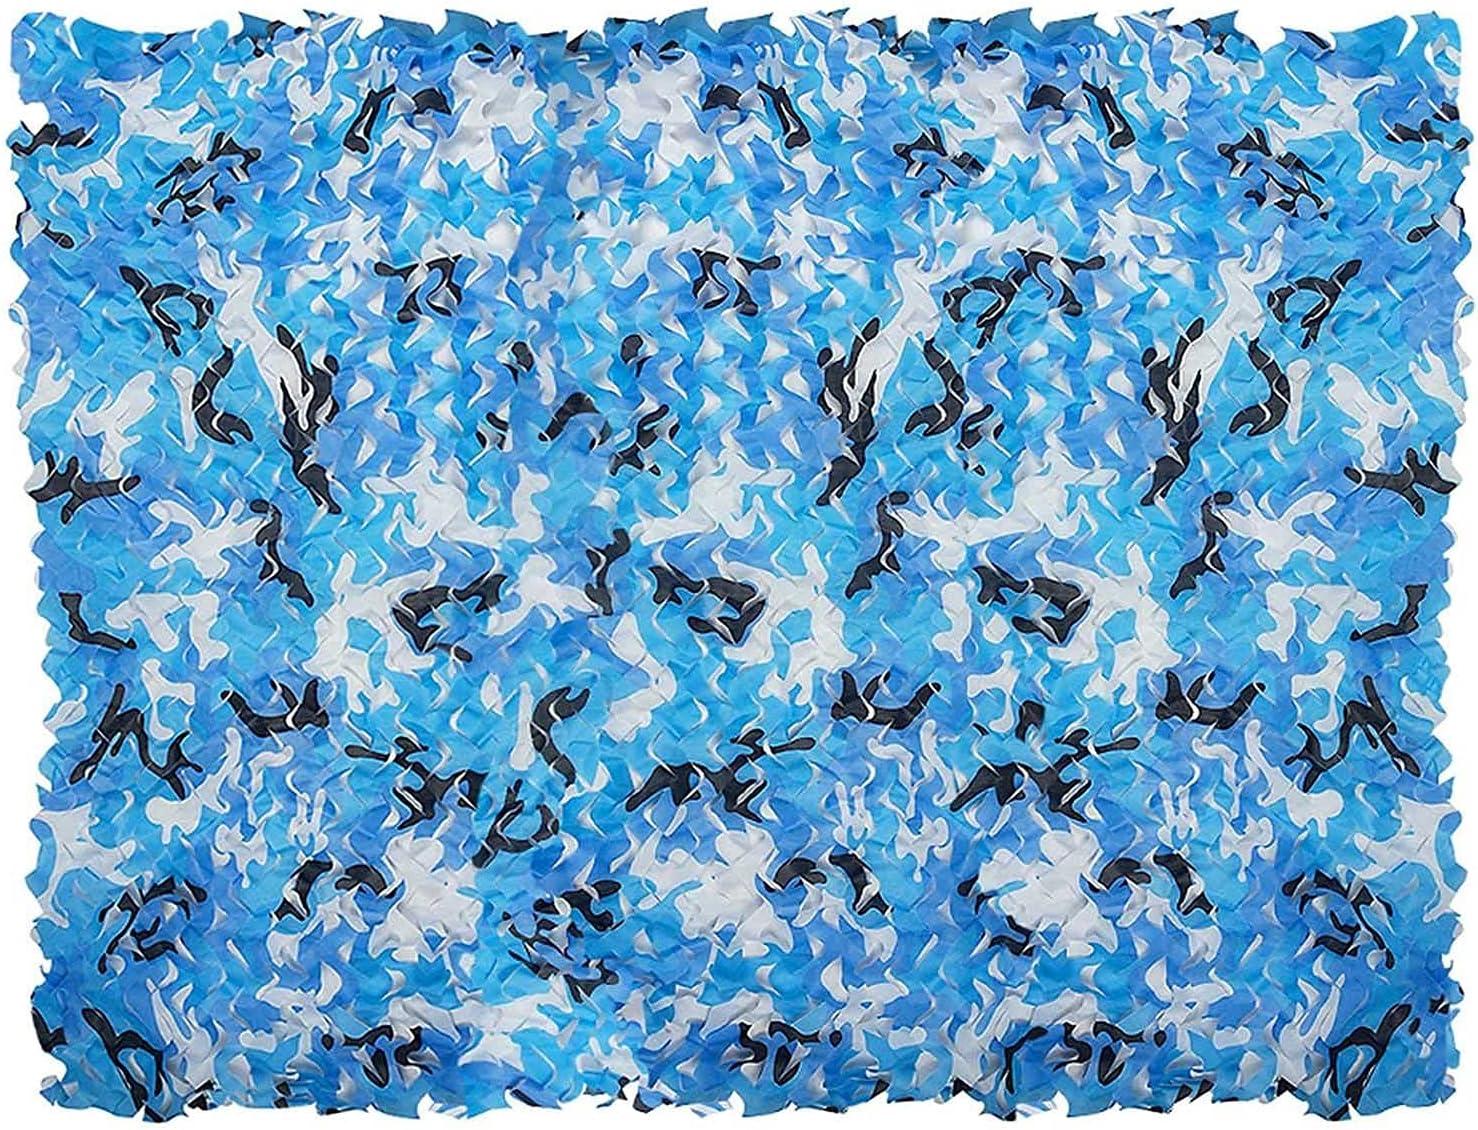 FUFU Max 55% OFF Detroit Mall Camouflage Net Camo Netting Decoration C